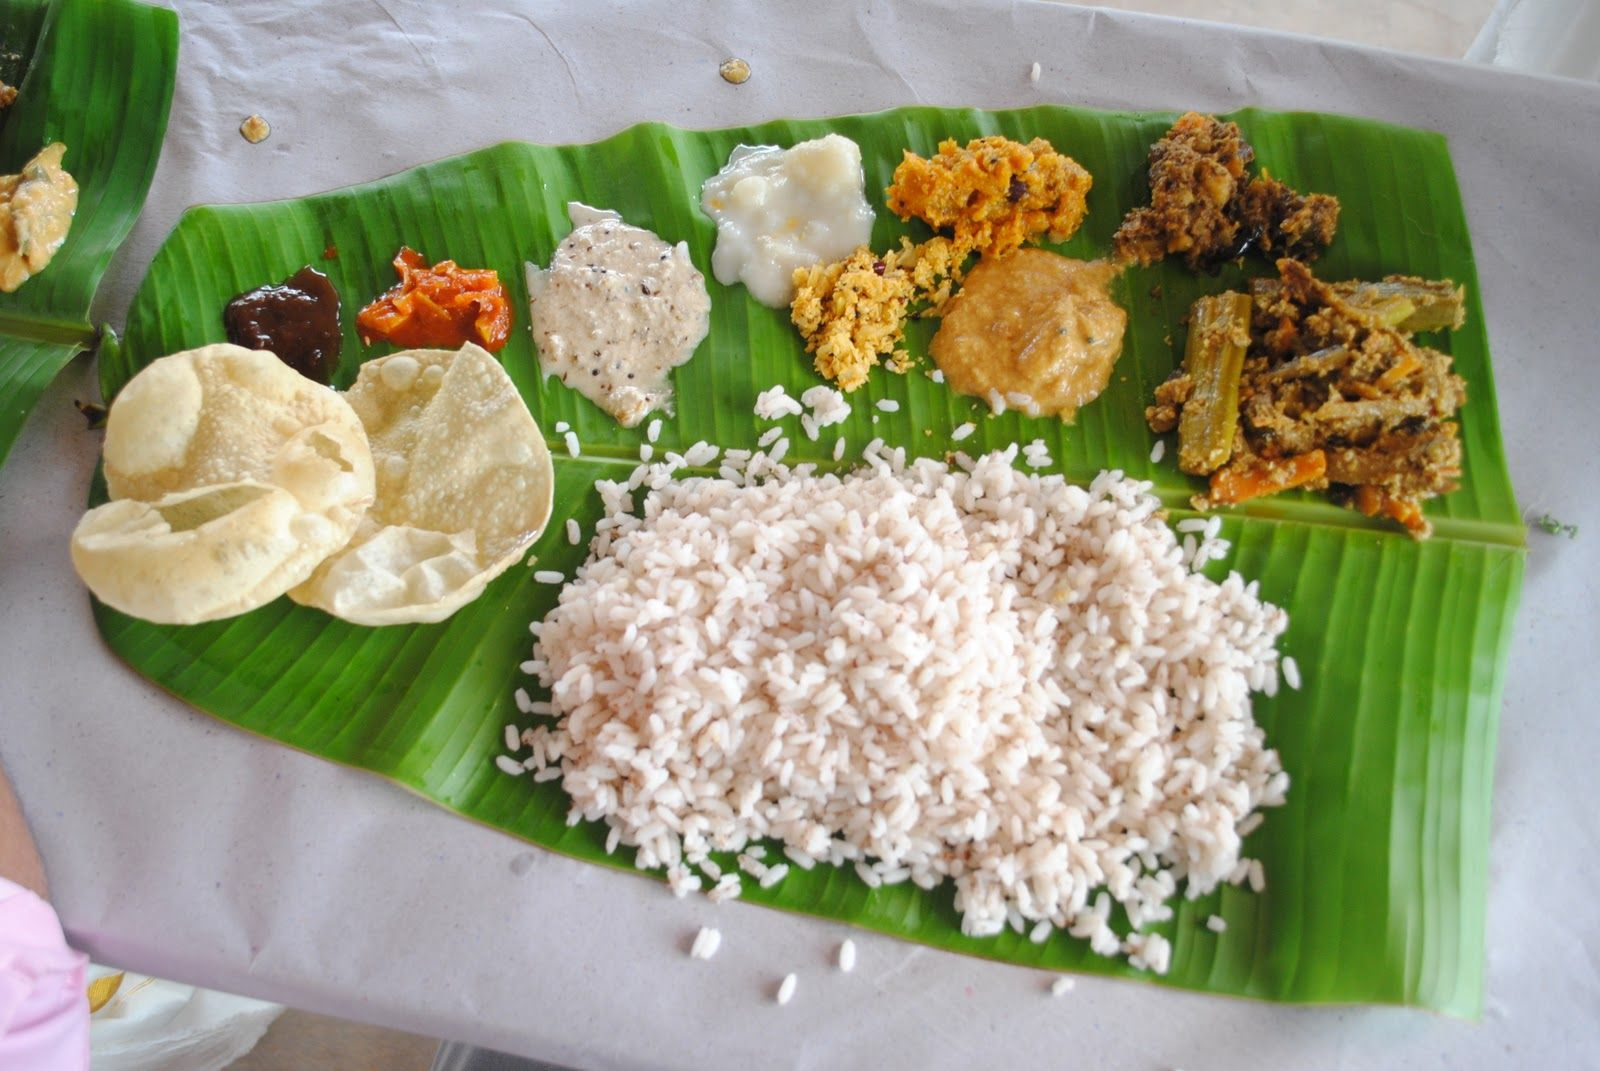 Kerala cuisine is quite diverse the diversity is best classified cuisine forumfinder Gallery